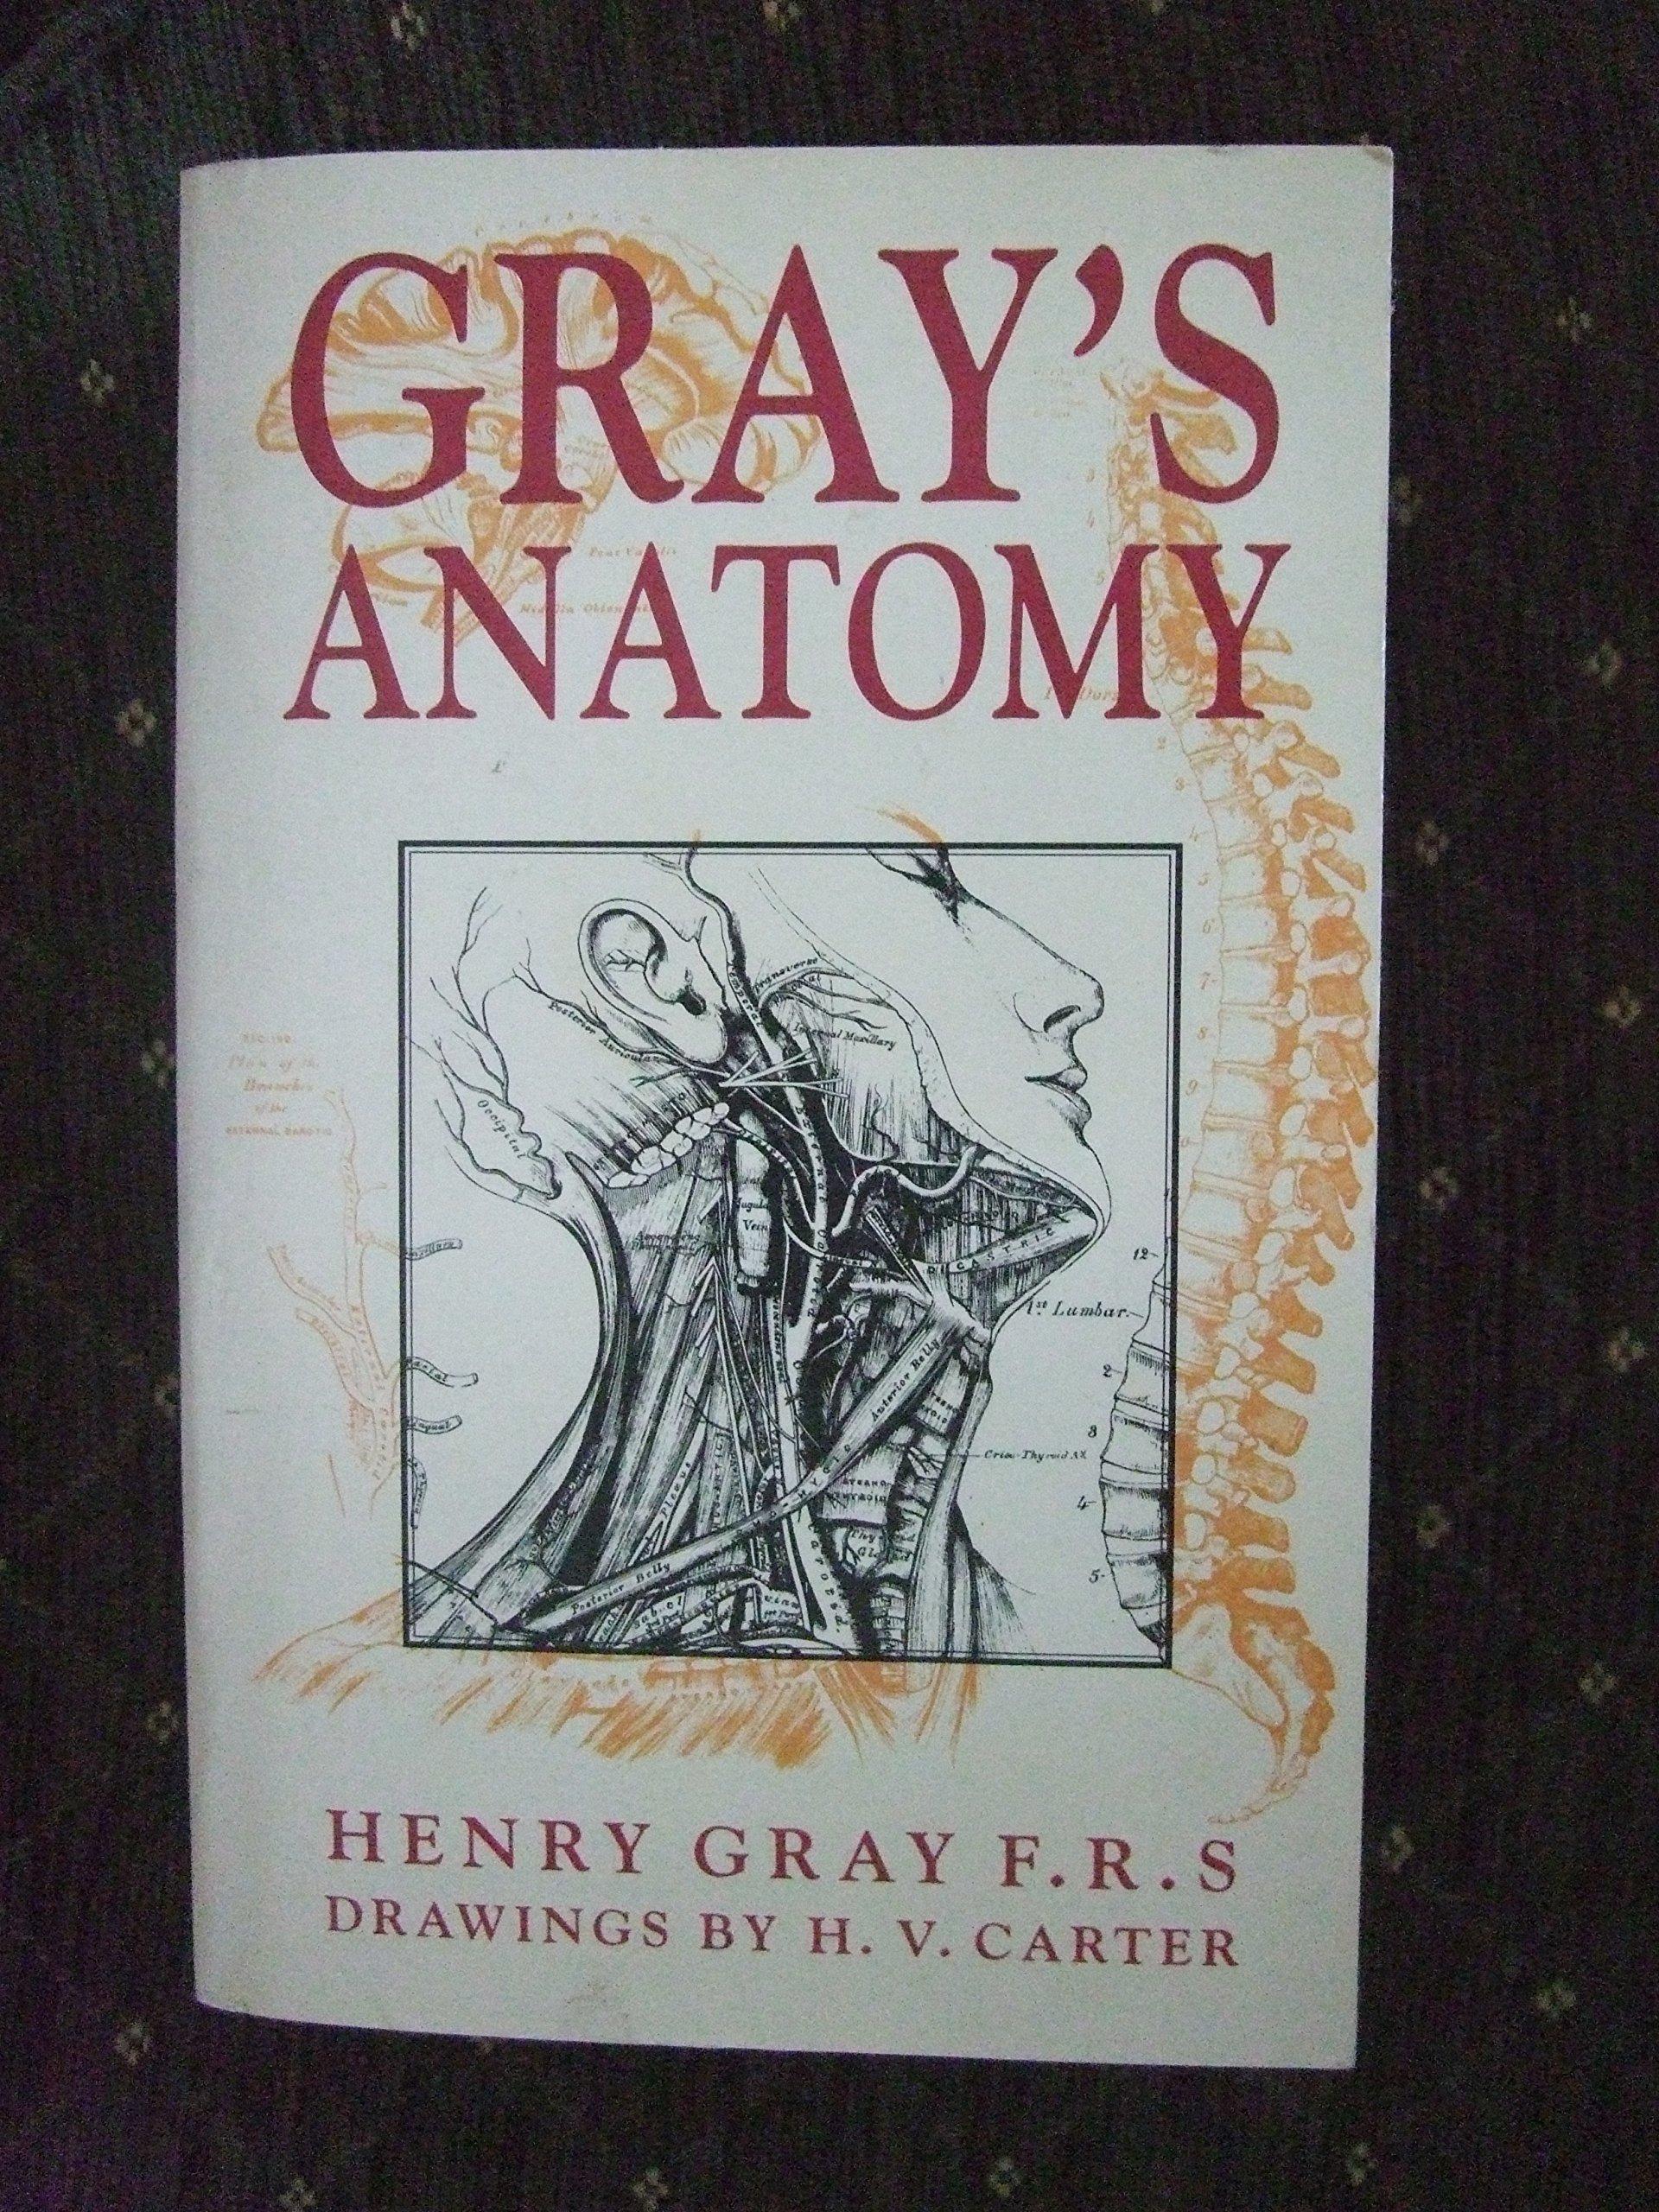 Gray\'s Anatomy: Amazon.co.uk: Henry Gray: 9781858132914: Books